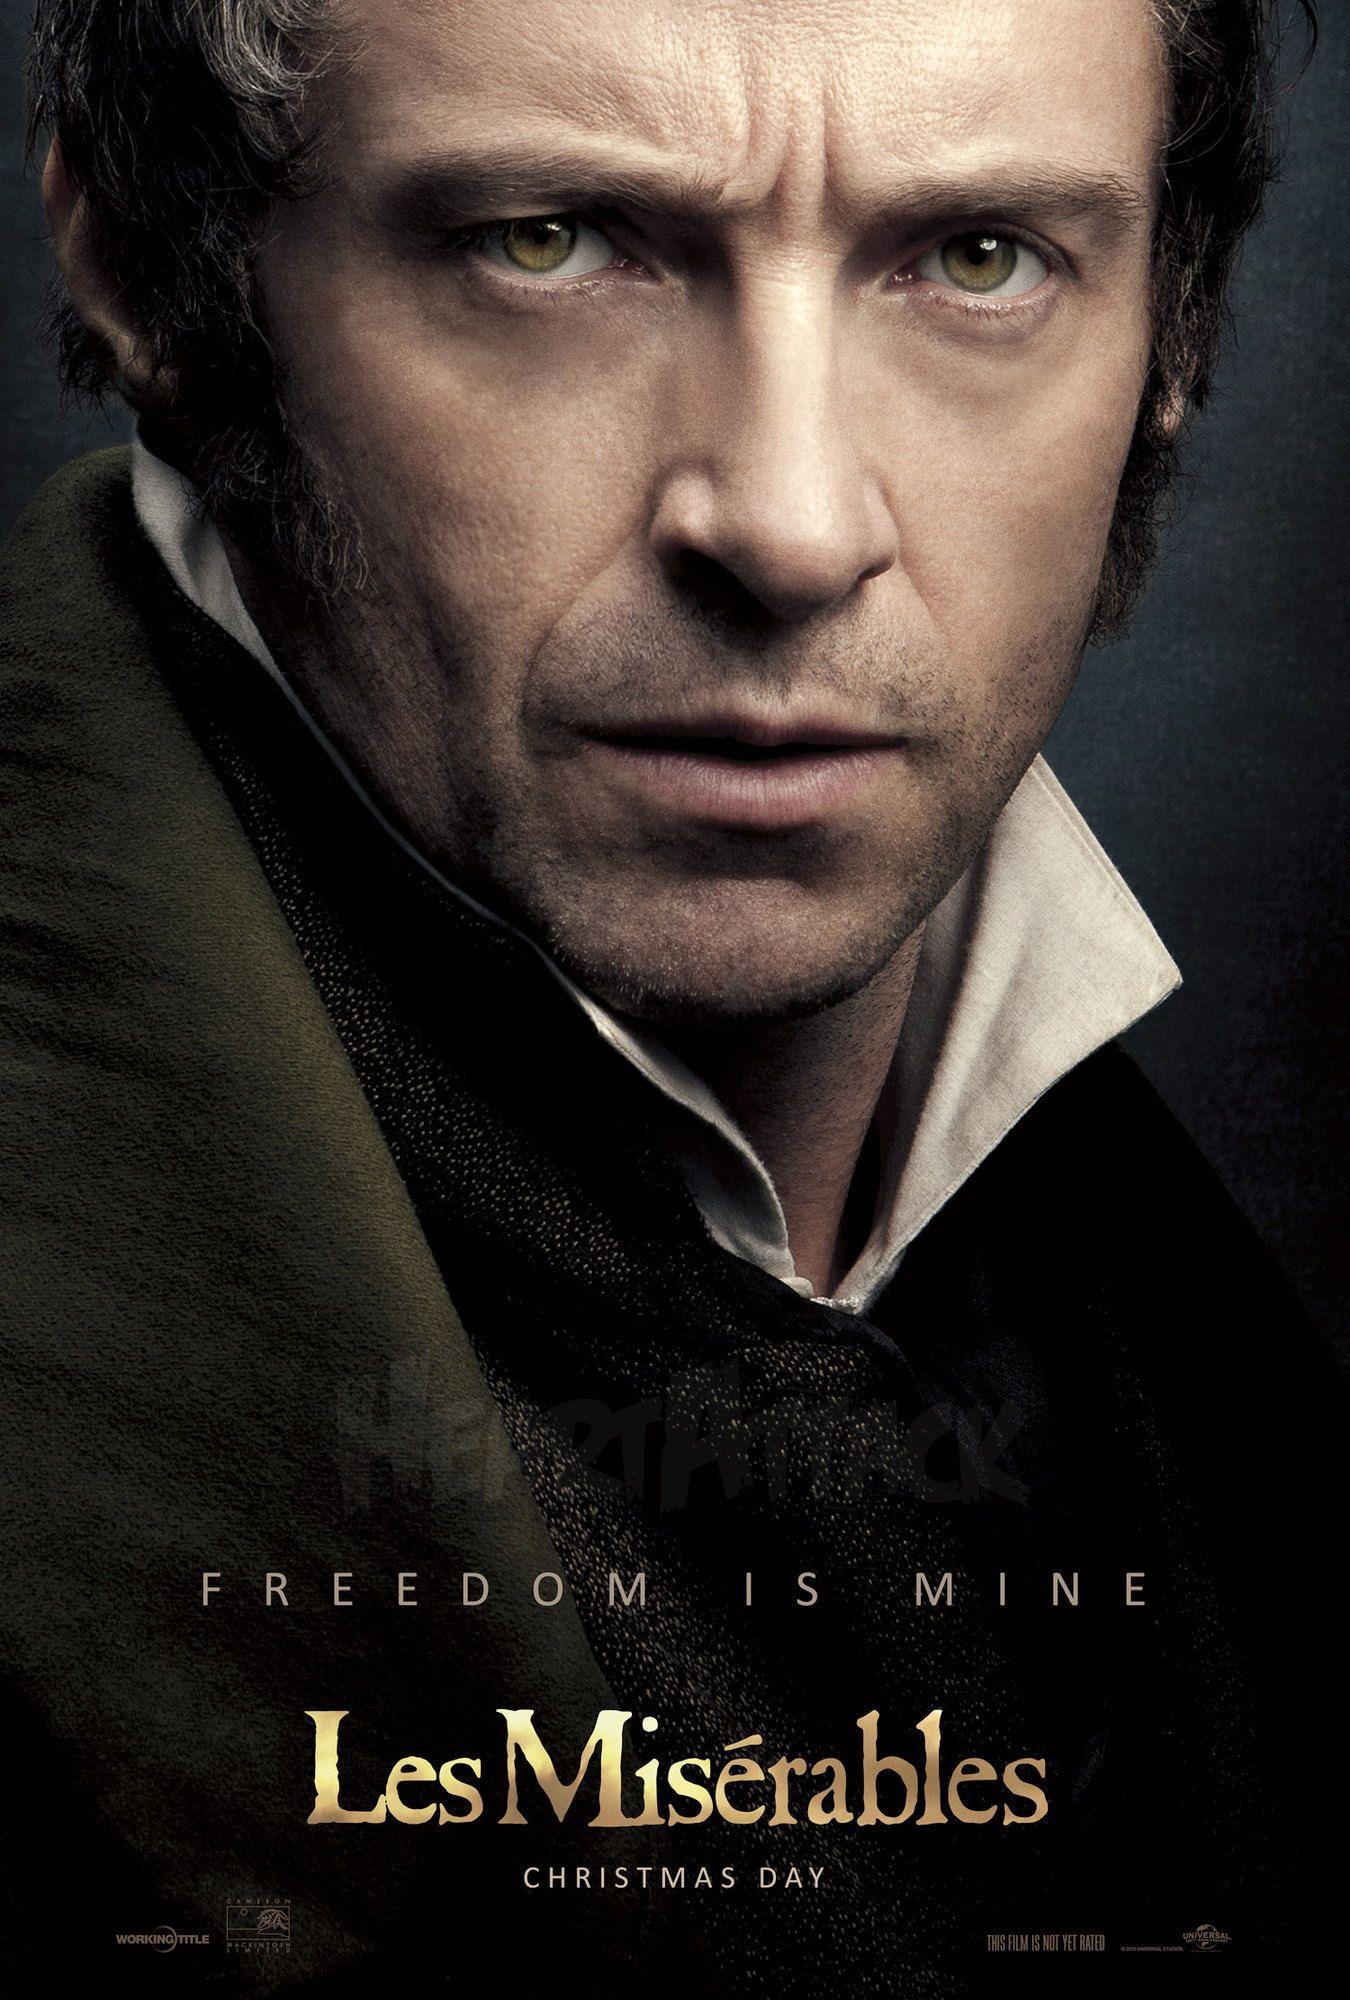 Hugh Jackman | ヒュー・ジャックマン, 映画